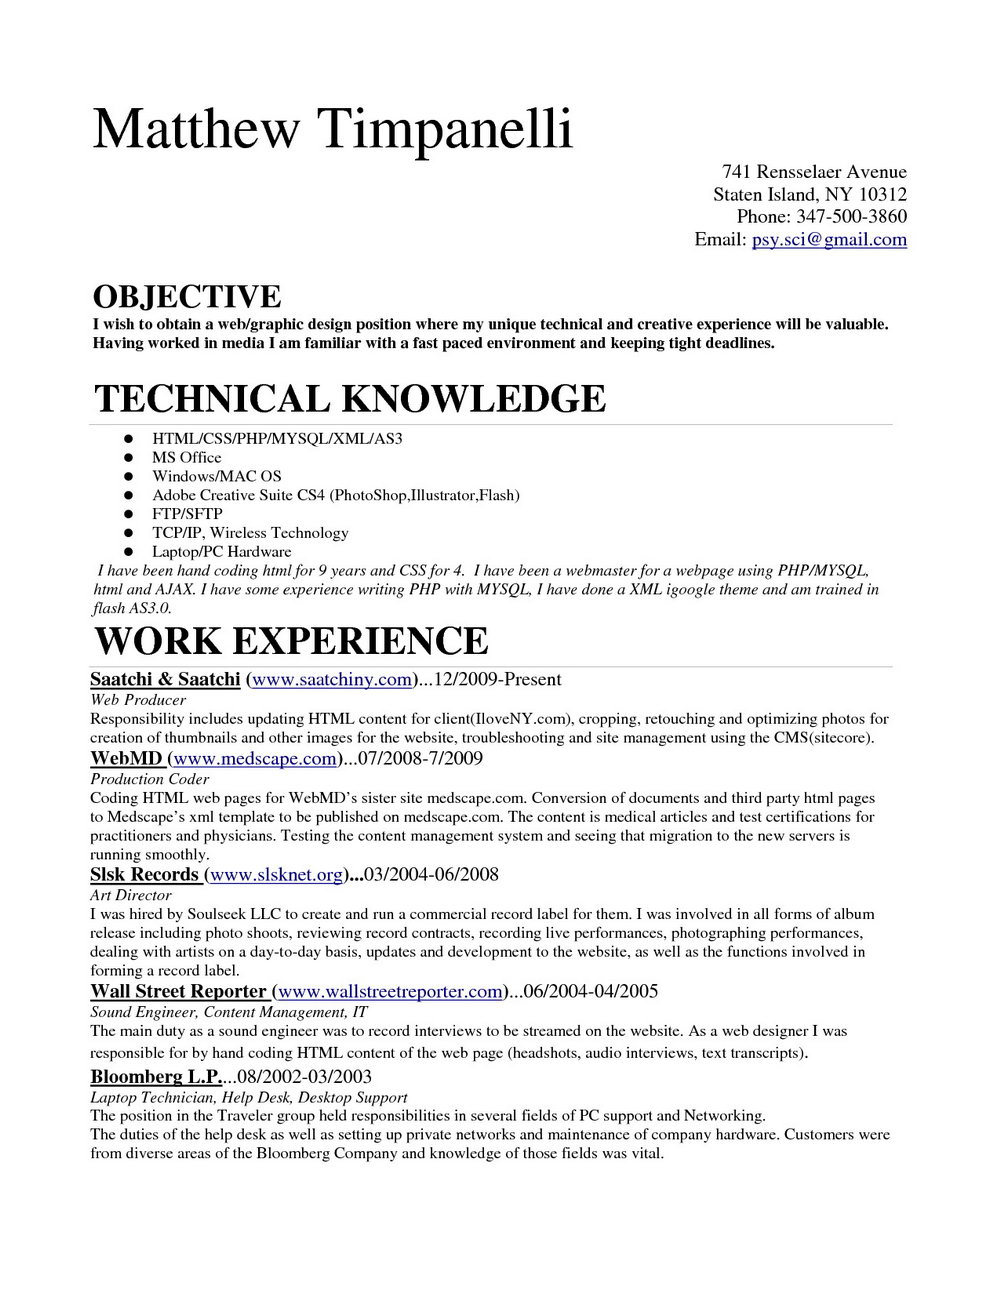 Sample Medical Resume Templates Templates 158305 Resume